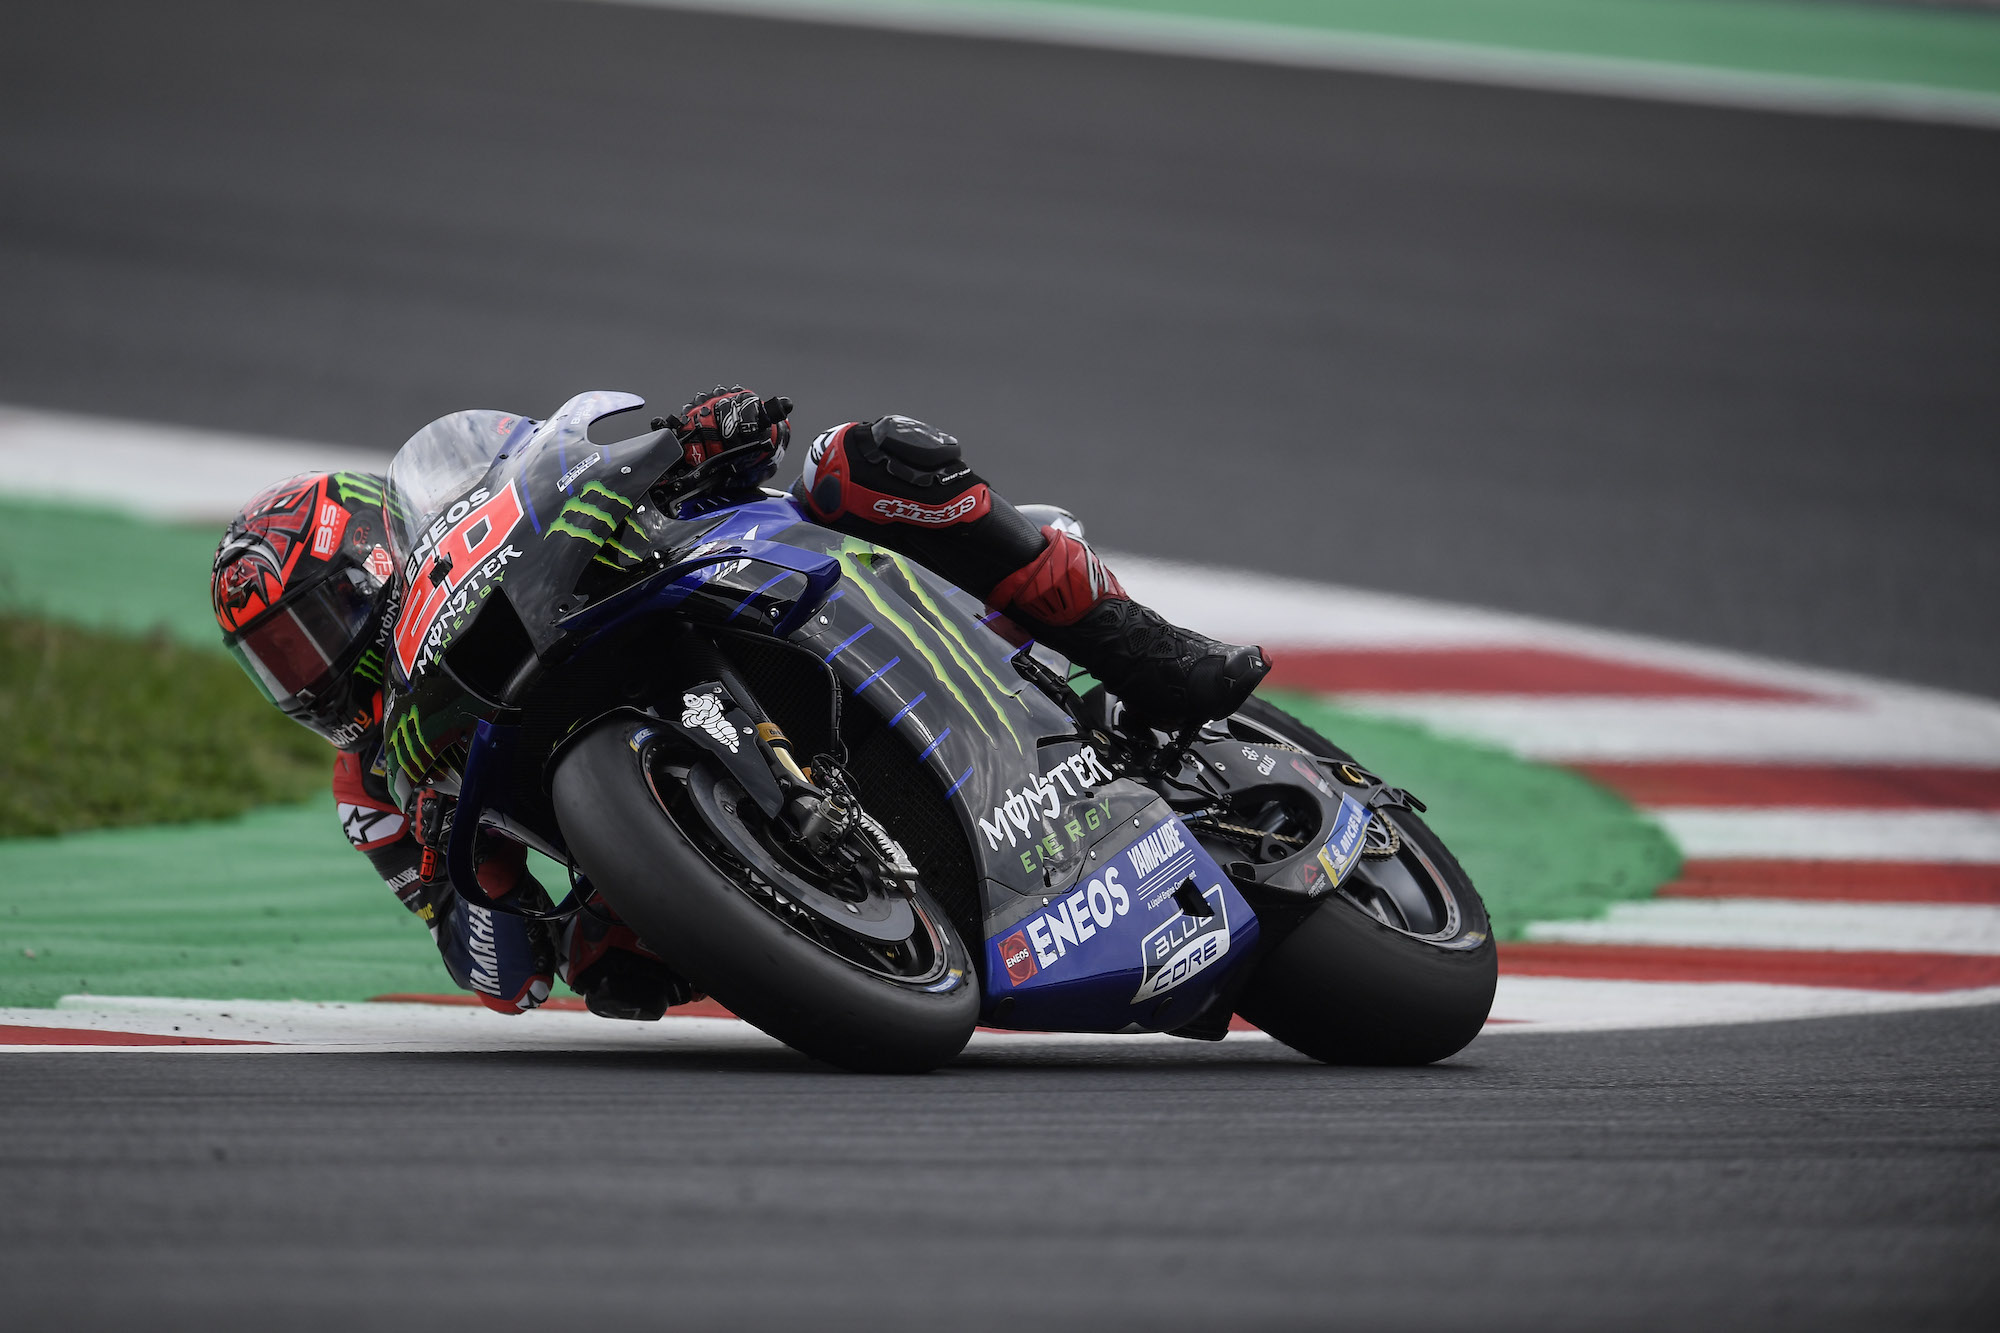 Fabio Quartararo podczas GP San Marino 2021 w Misano